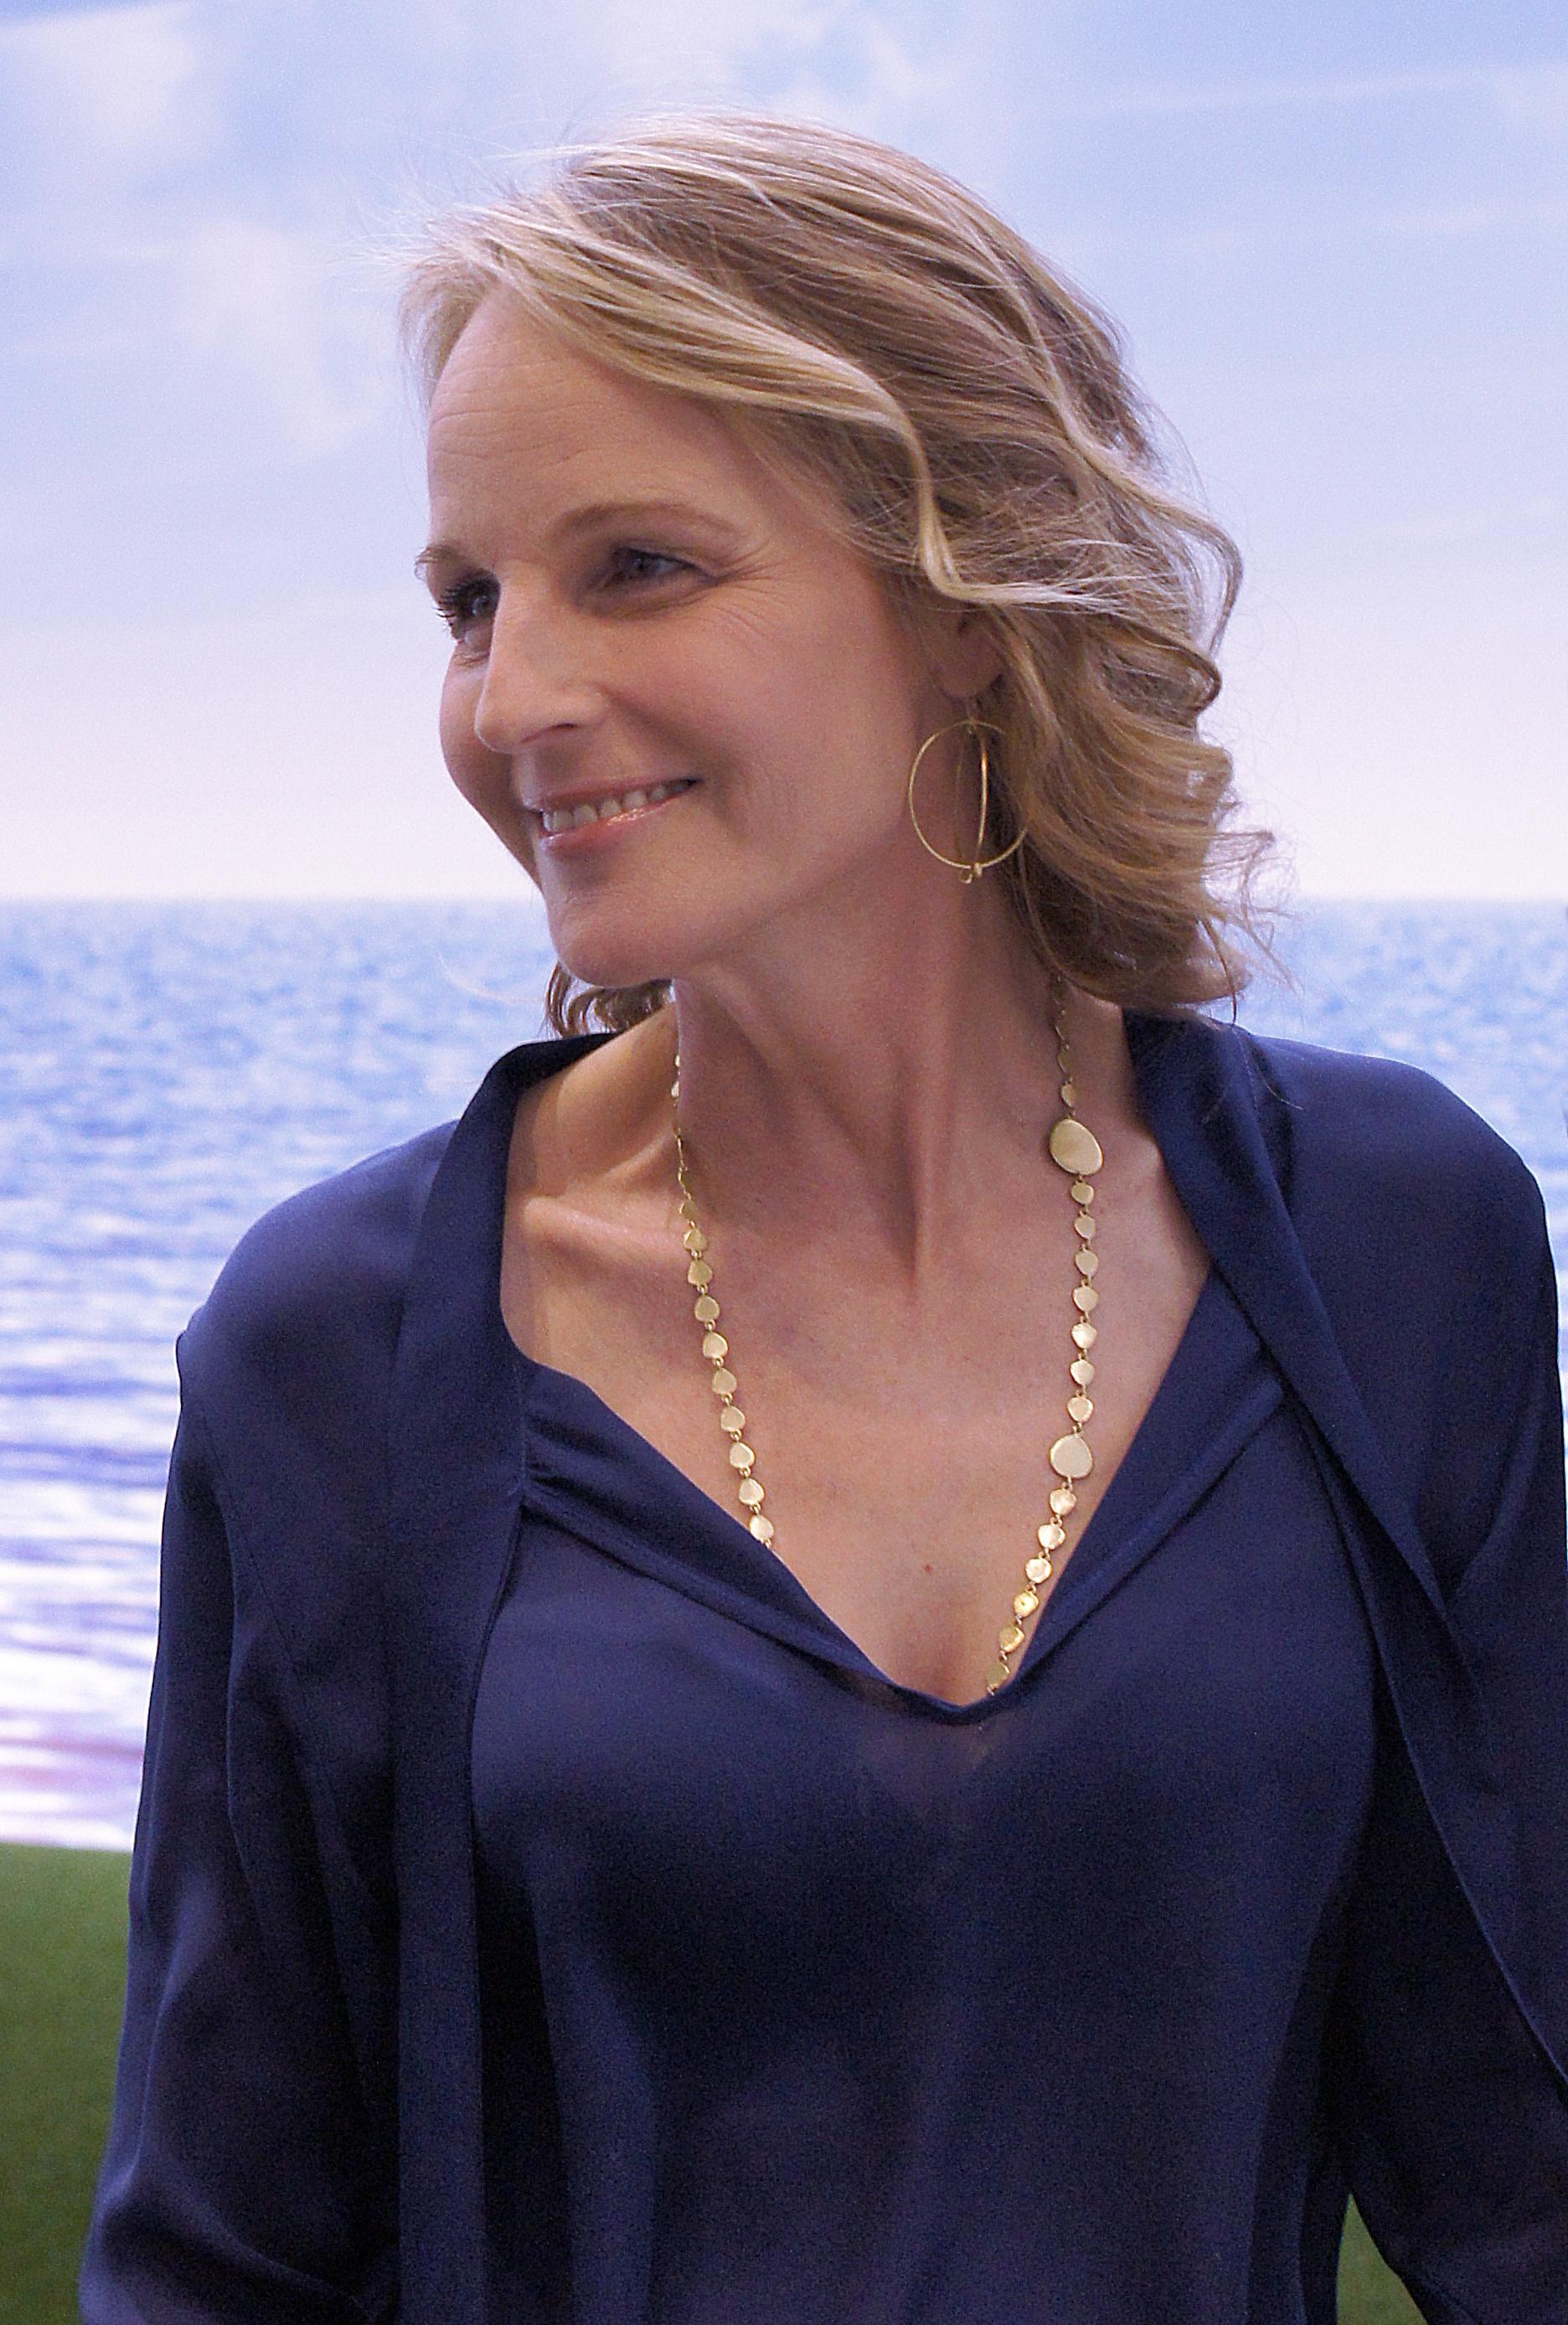 Nancy Bea Porno helen hunt - wikipedia